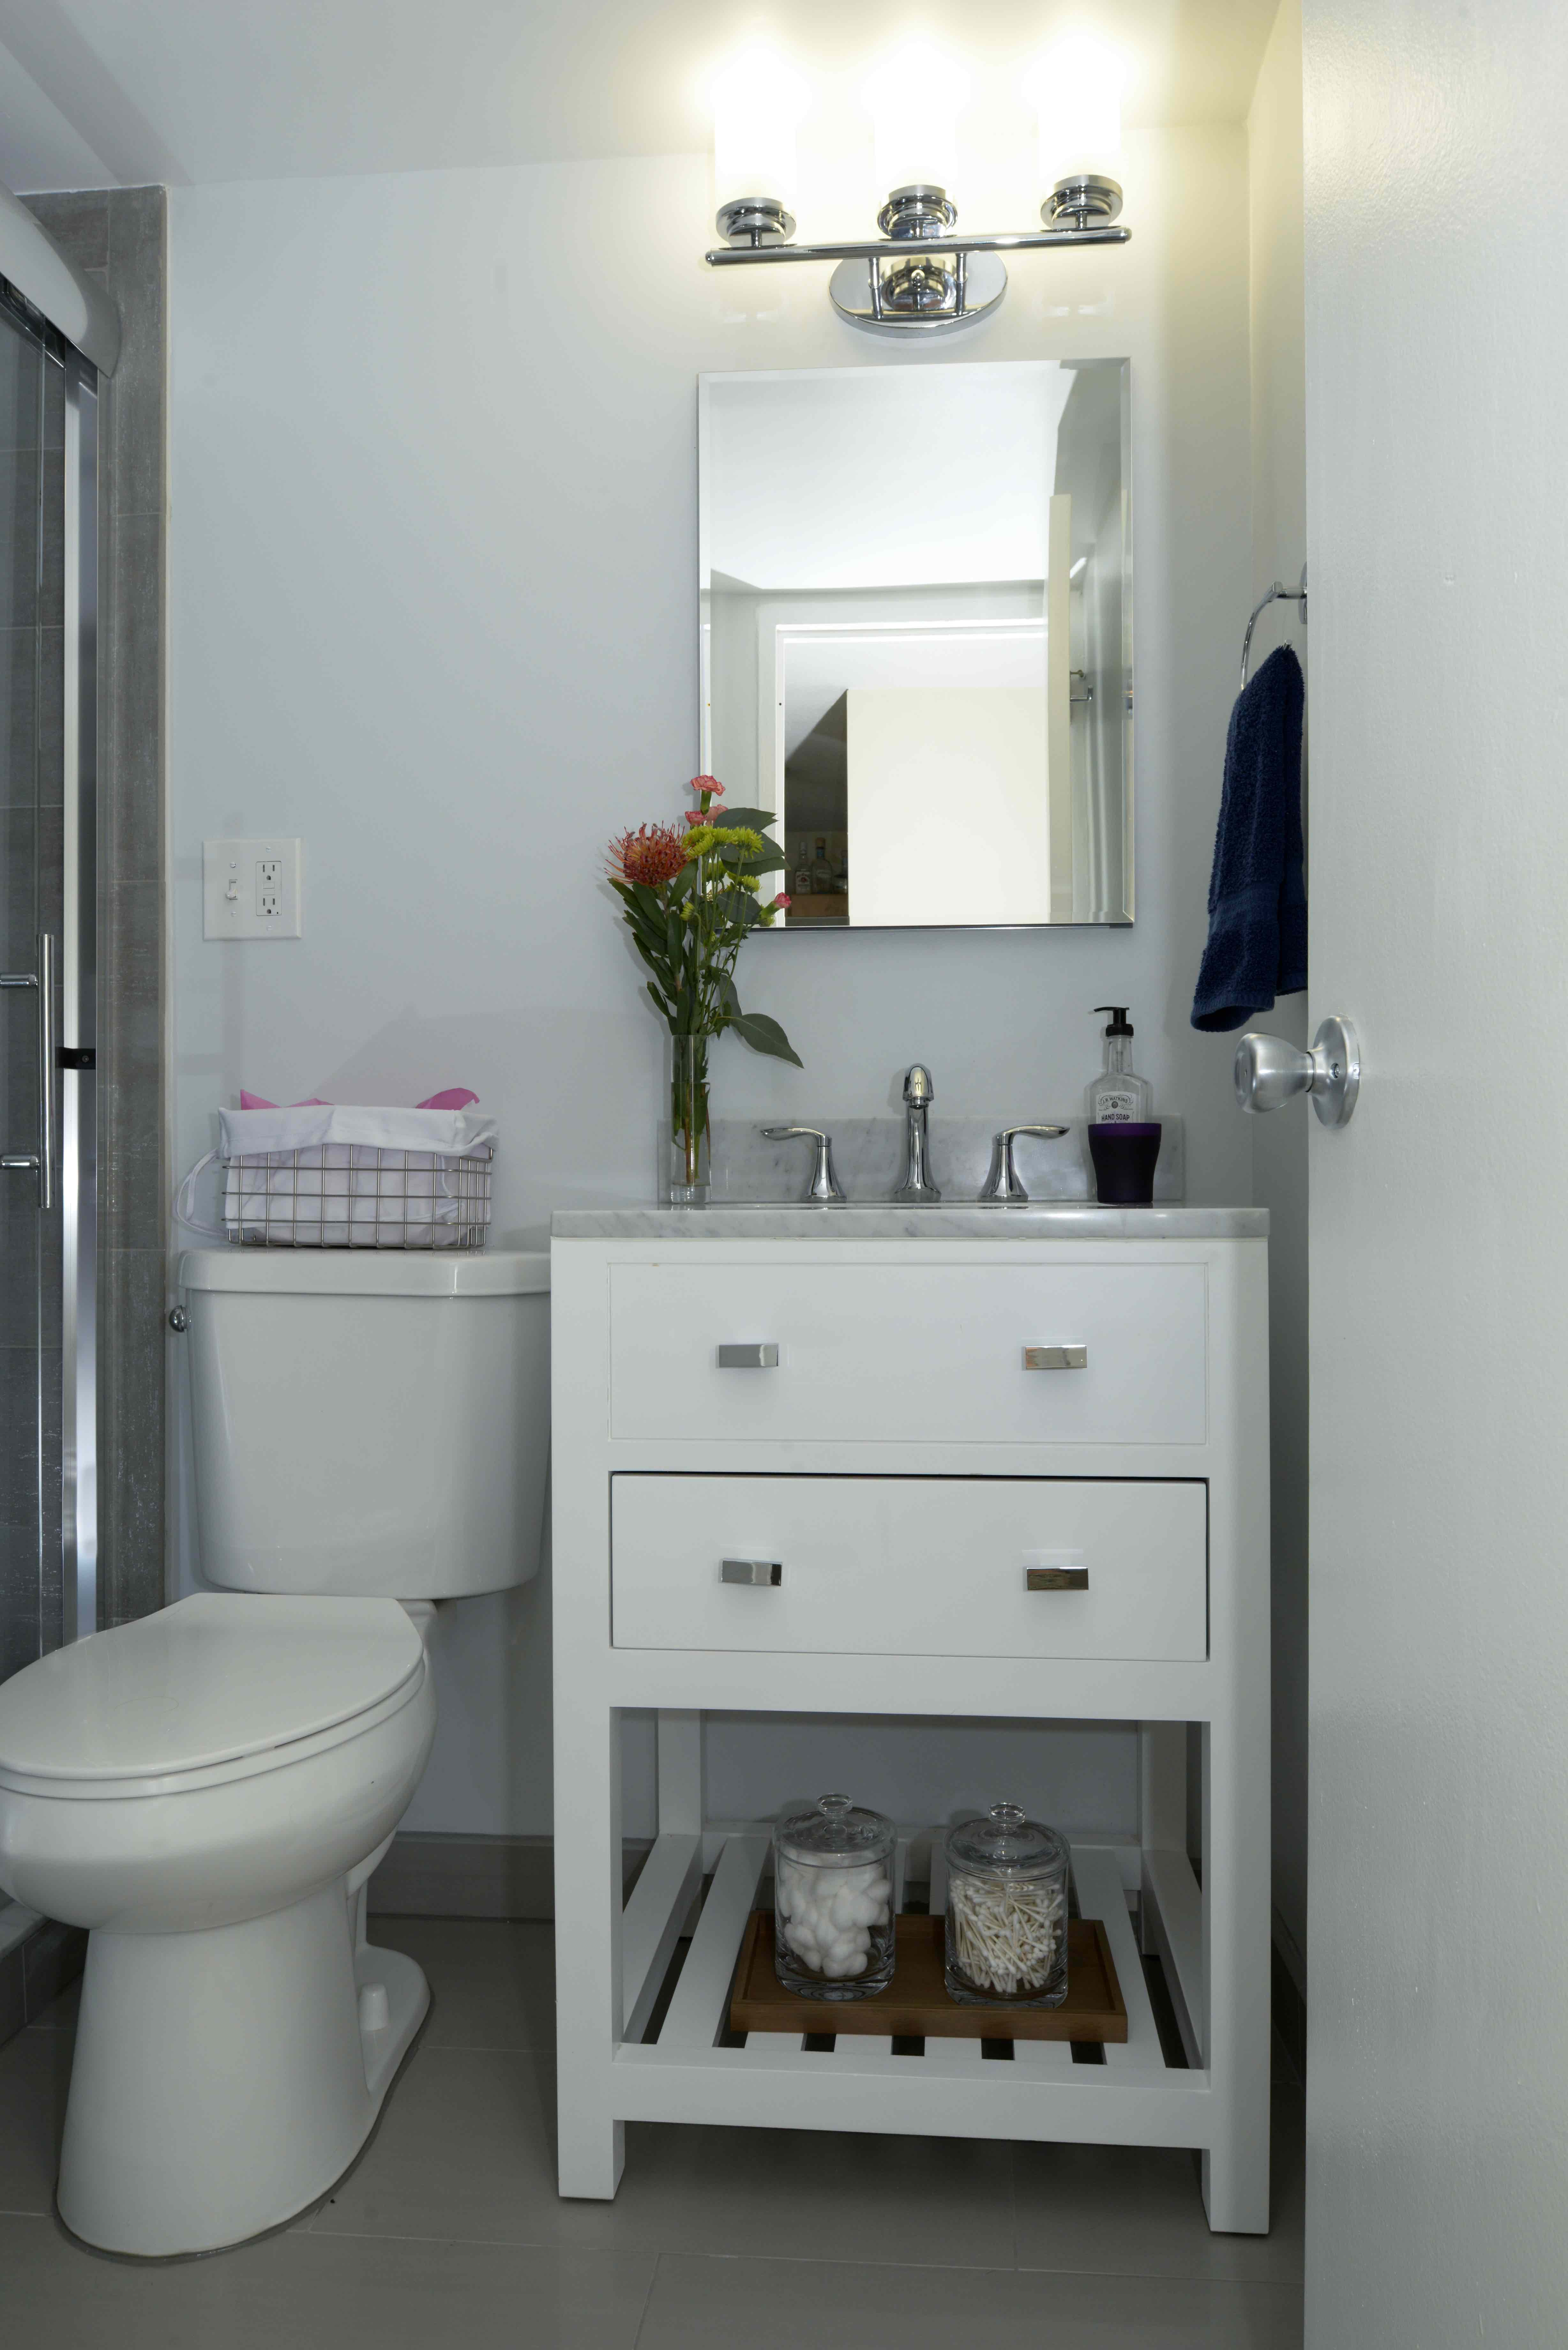 Karma Home Designs Photos. Bathroom Remodel